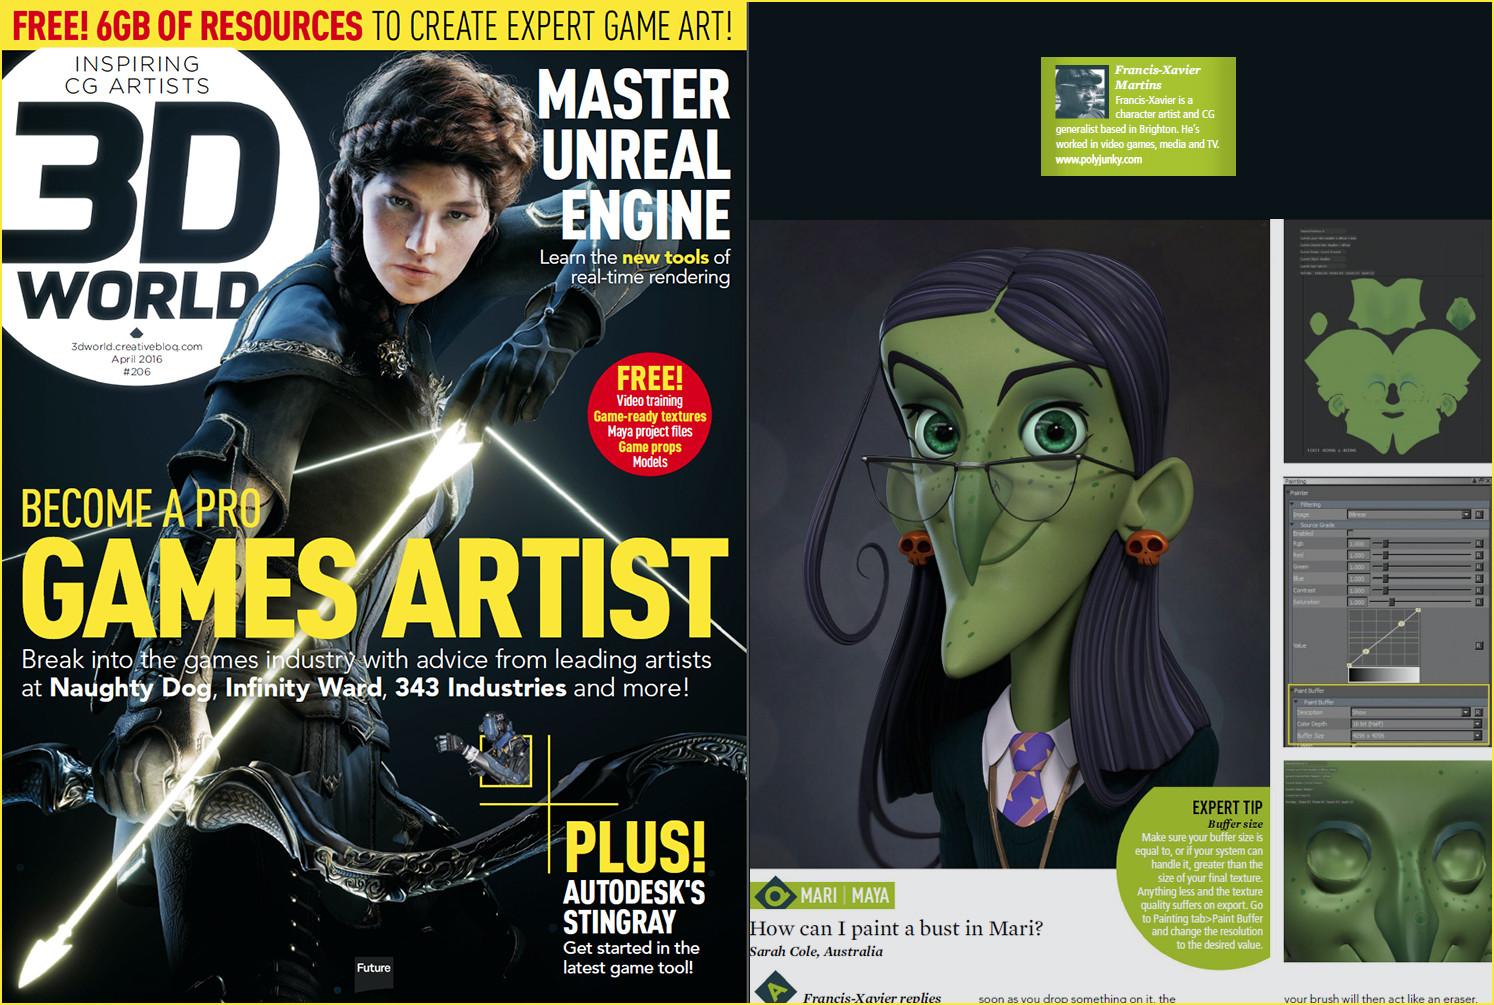 Mari tutorial for 3d World magazine. April 2016.